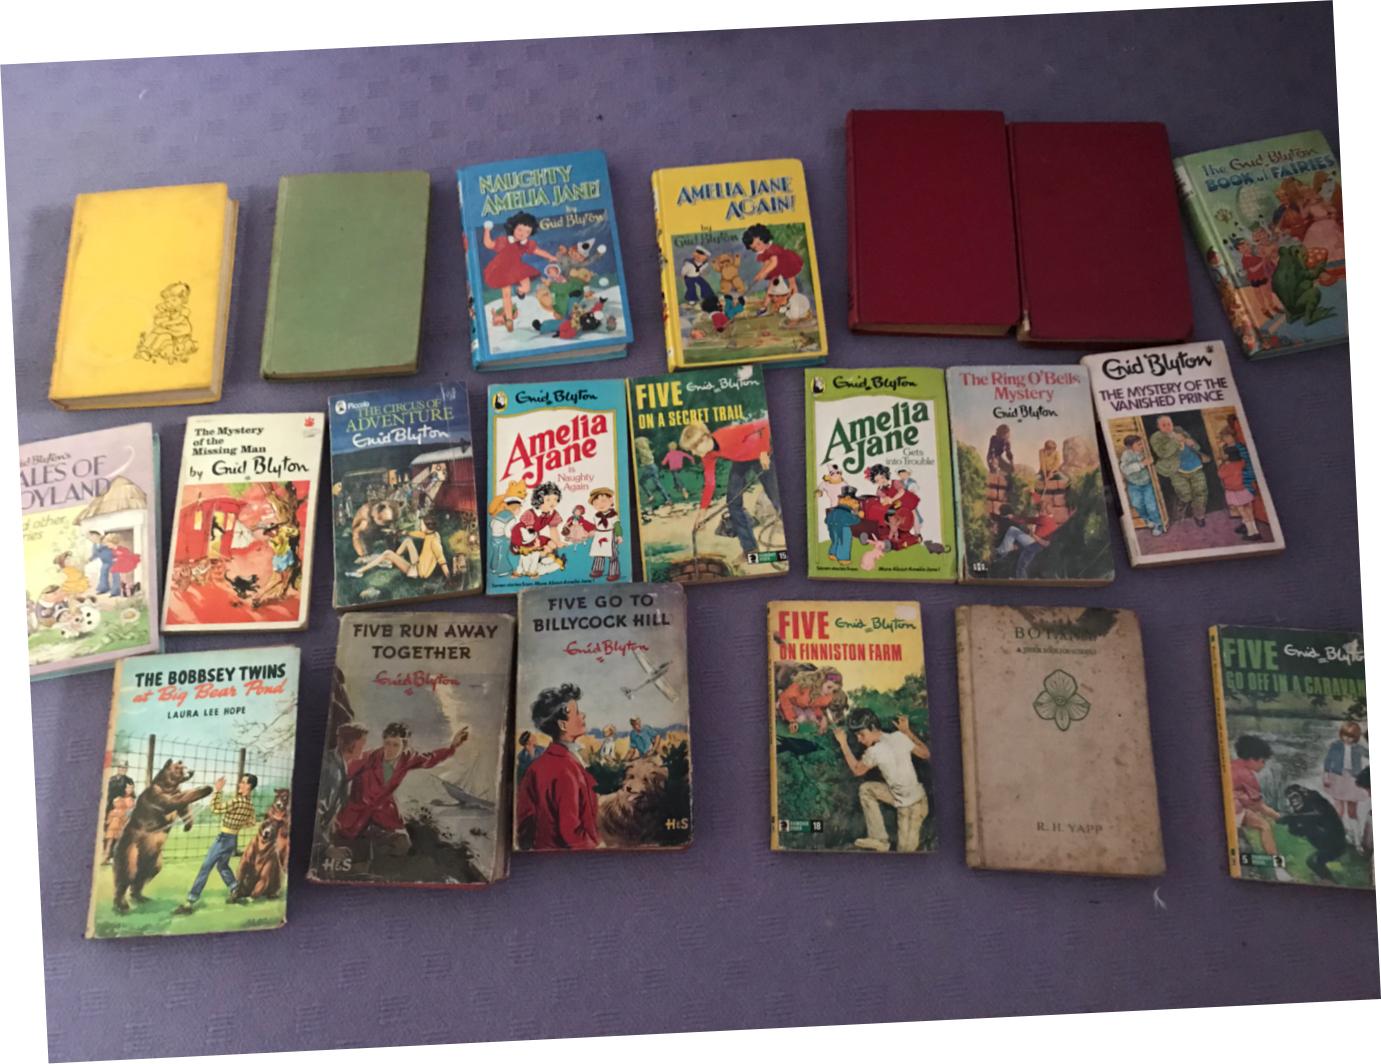 blyton books enid Vintage